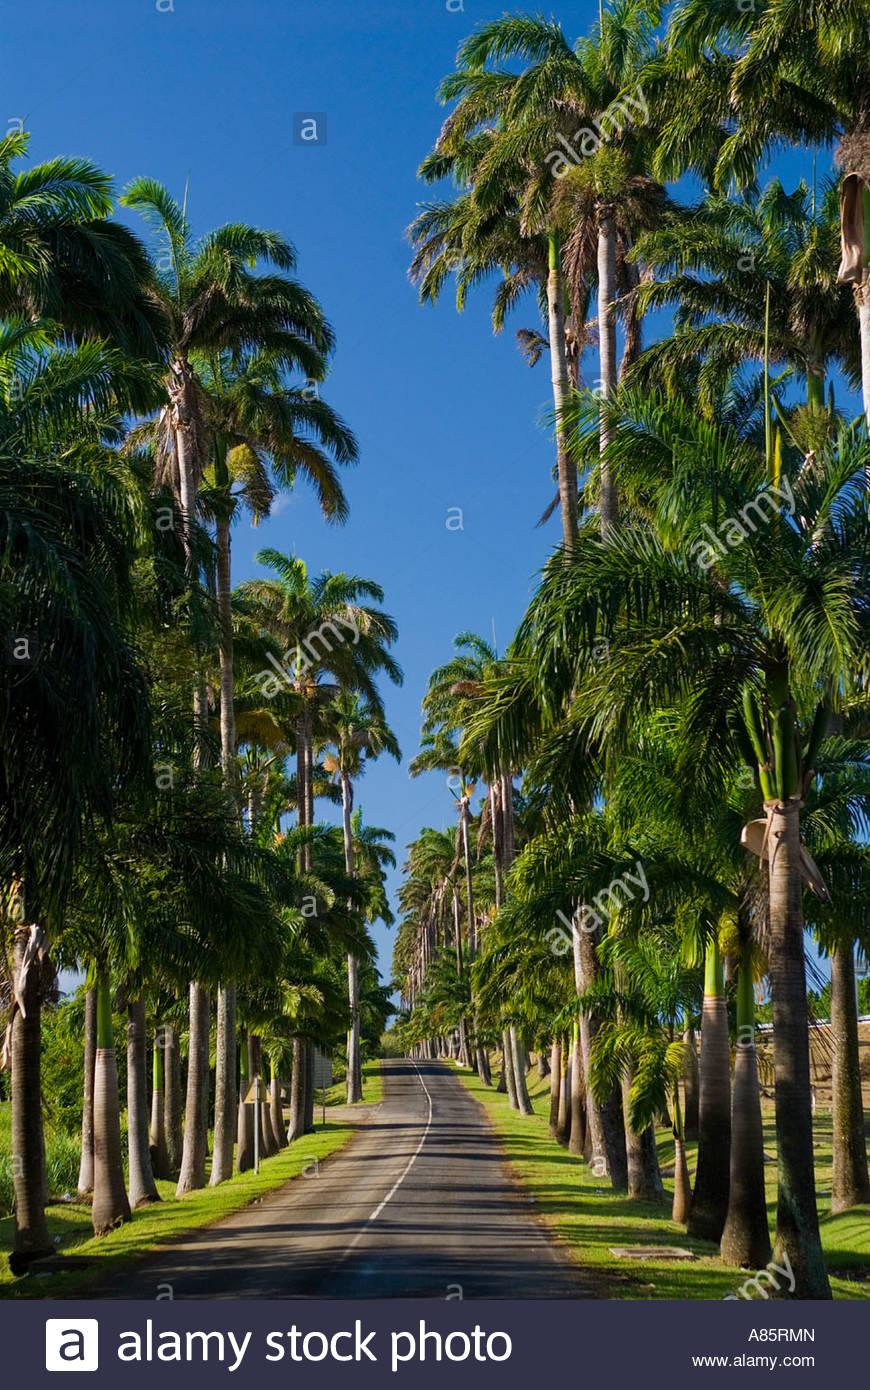 Royal Palms lining the road, Allée Dumanoir, Basse Terre, Guadeloupe, Leeward Islands, Caribbean - Stock Image